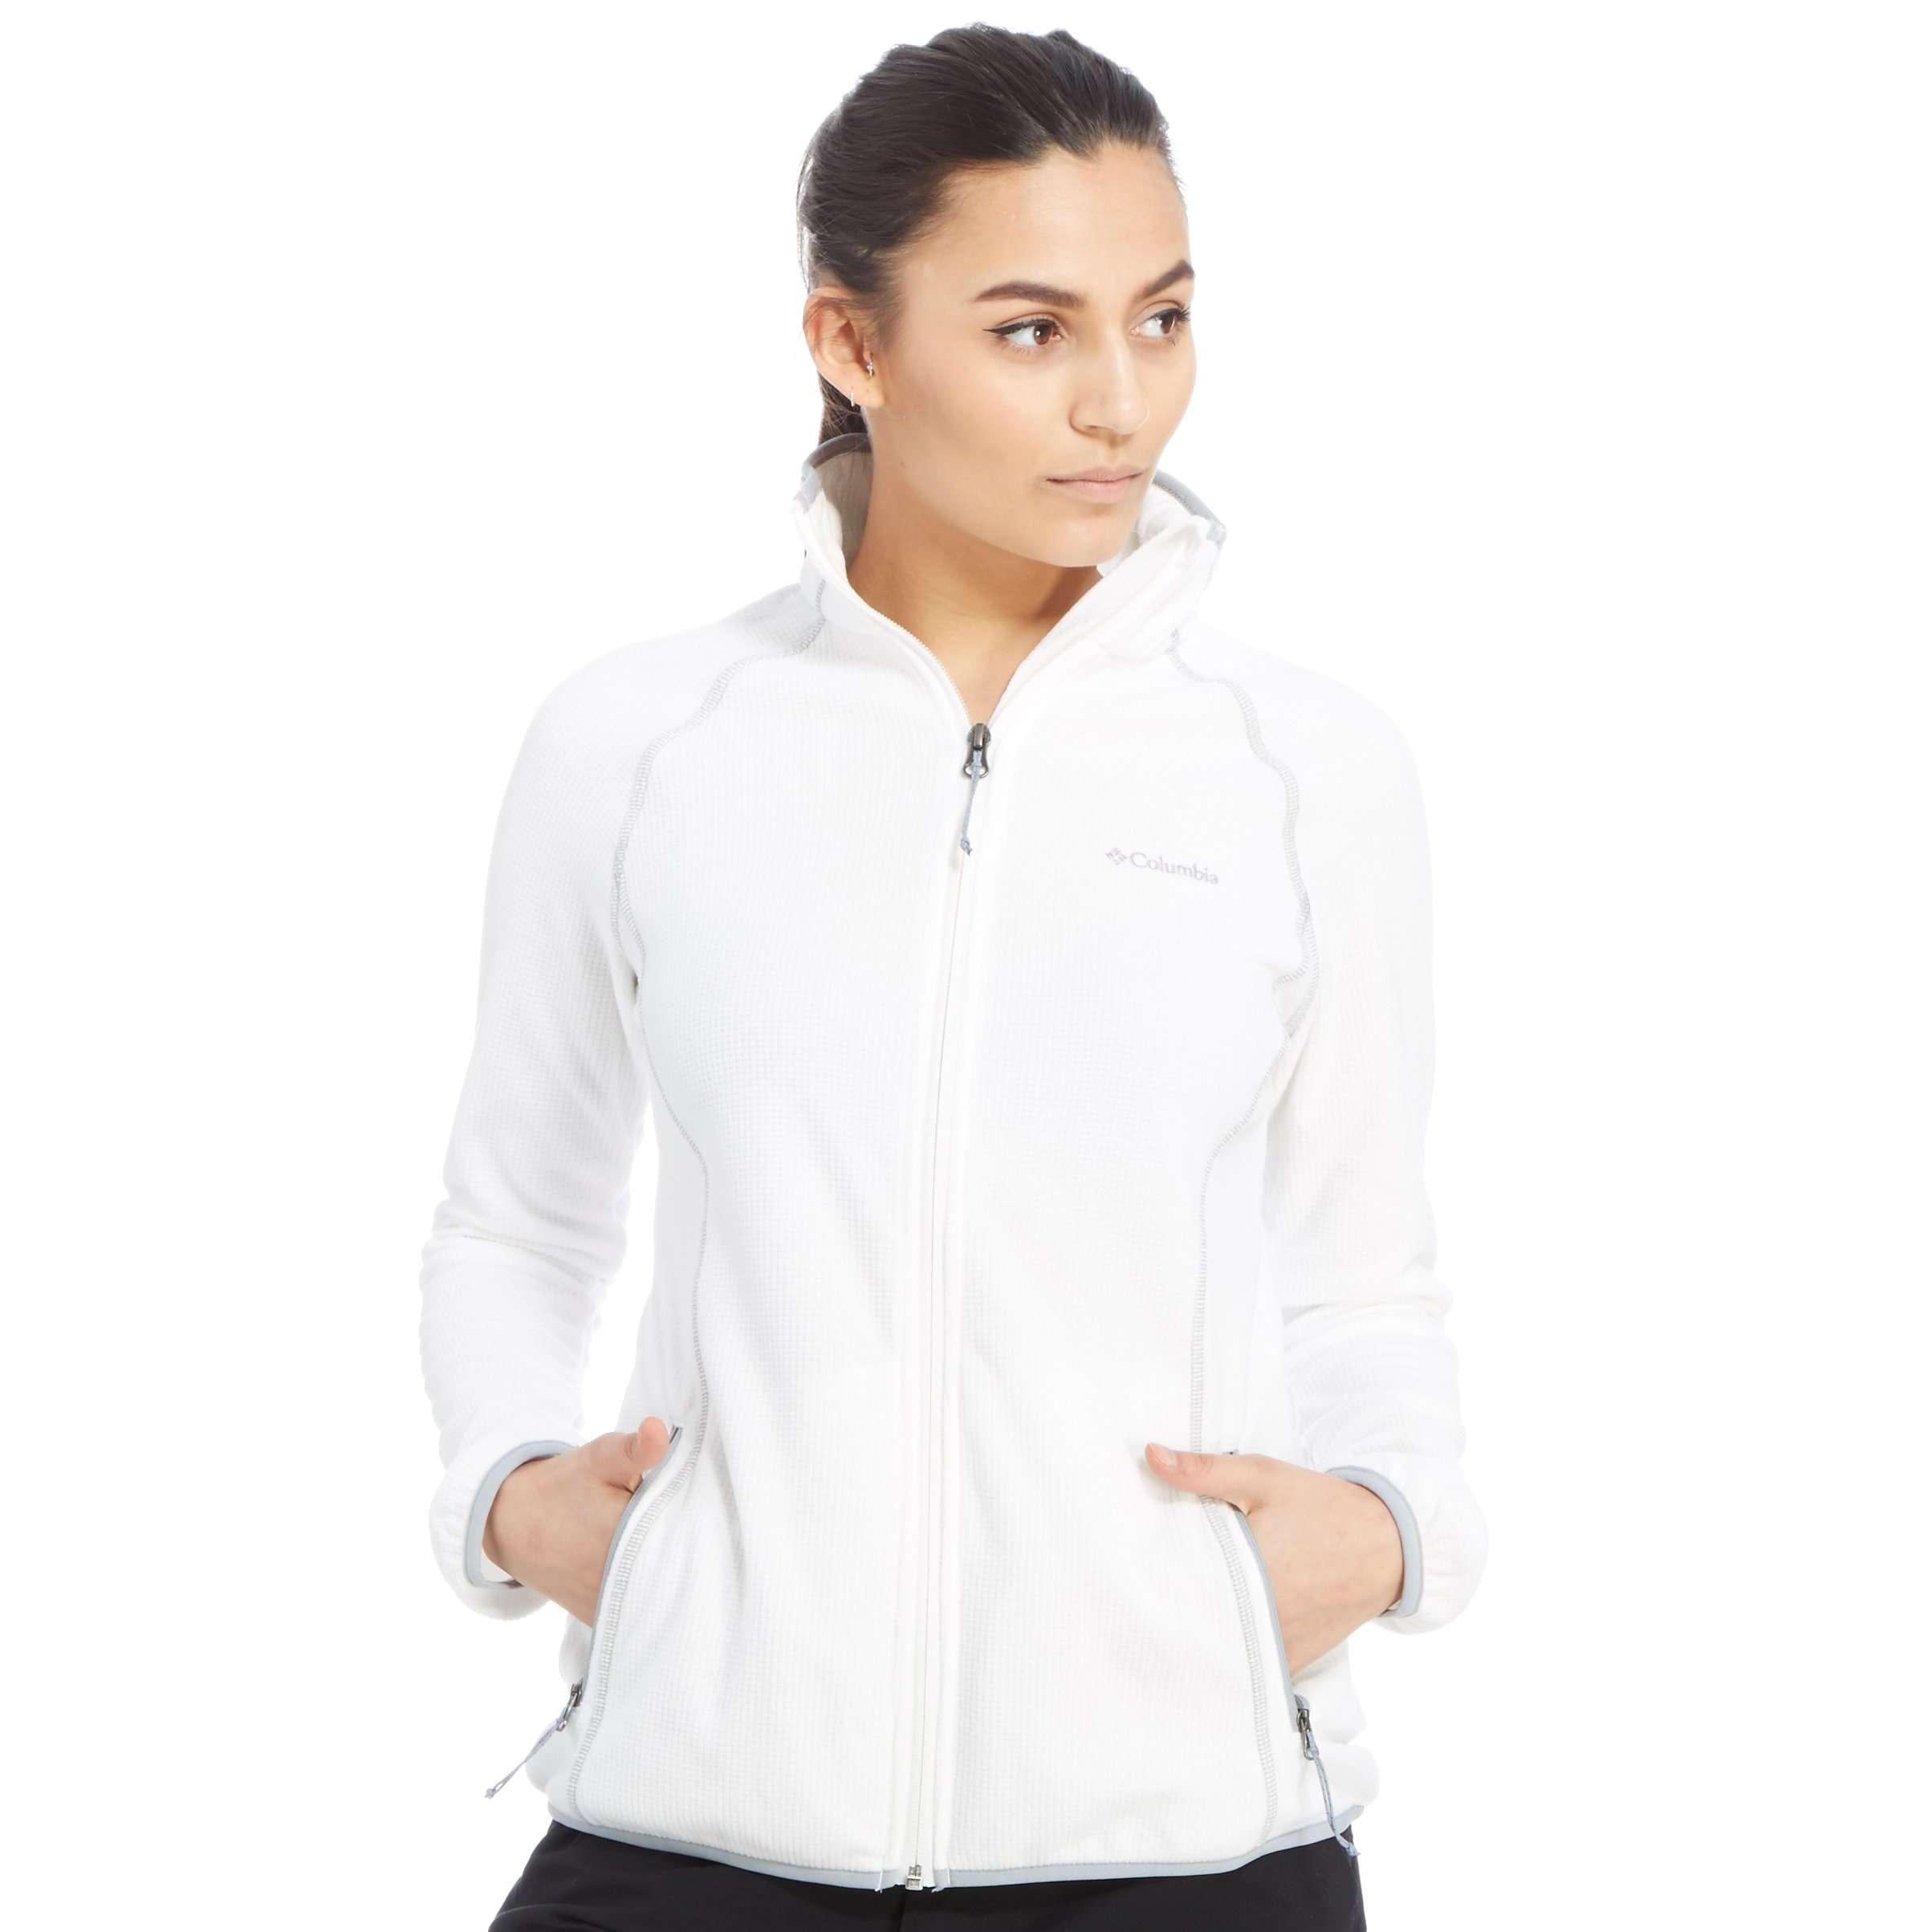 COLUMBIA Women's Trails Edge™ Fleece Jacket